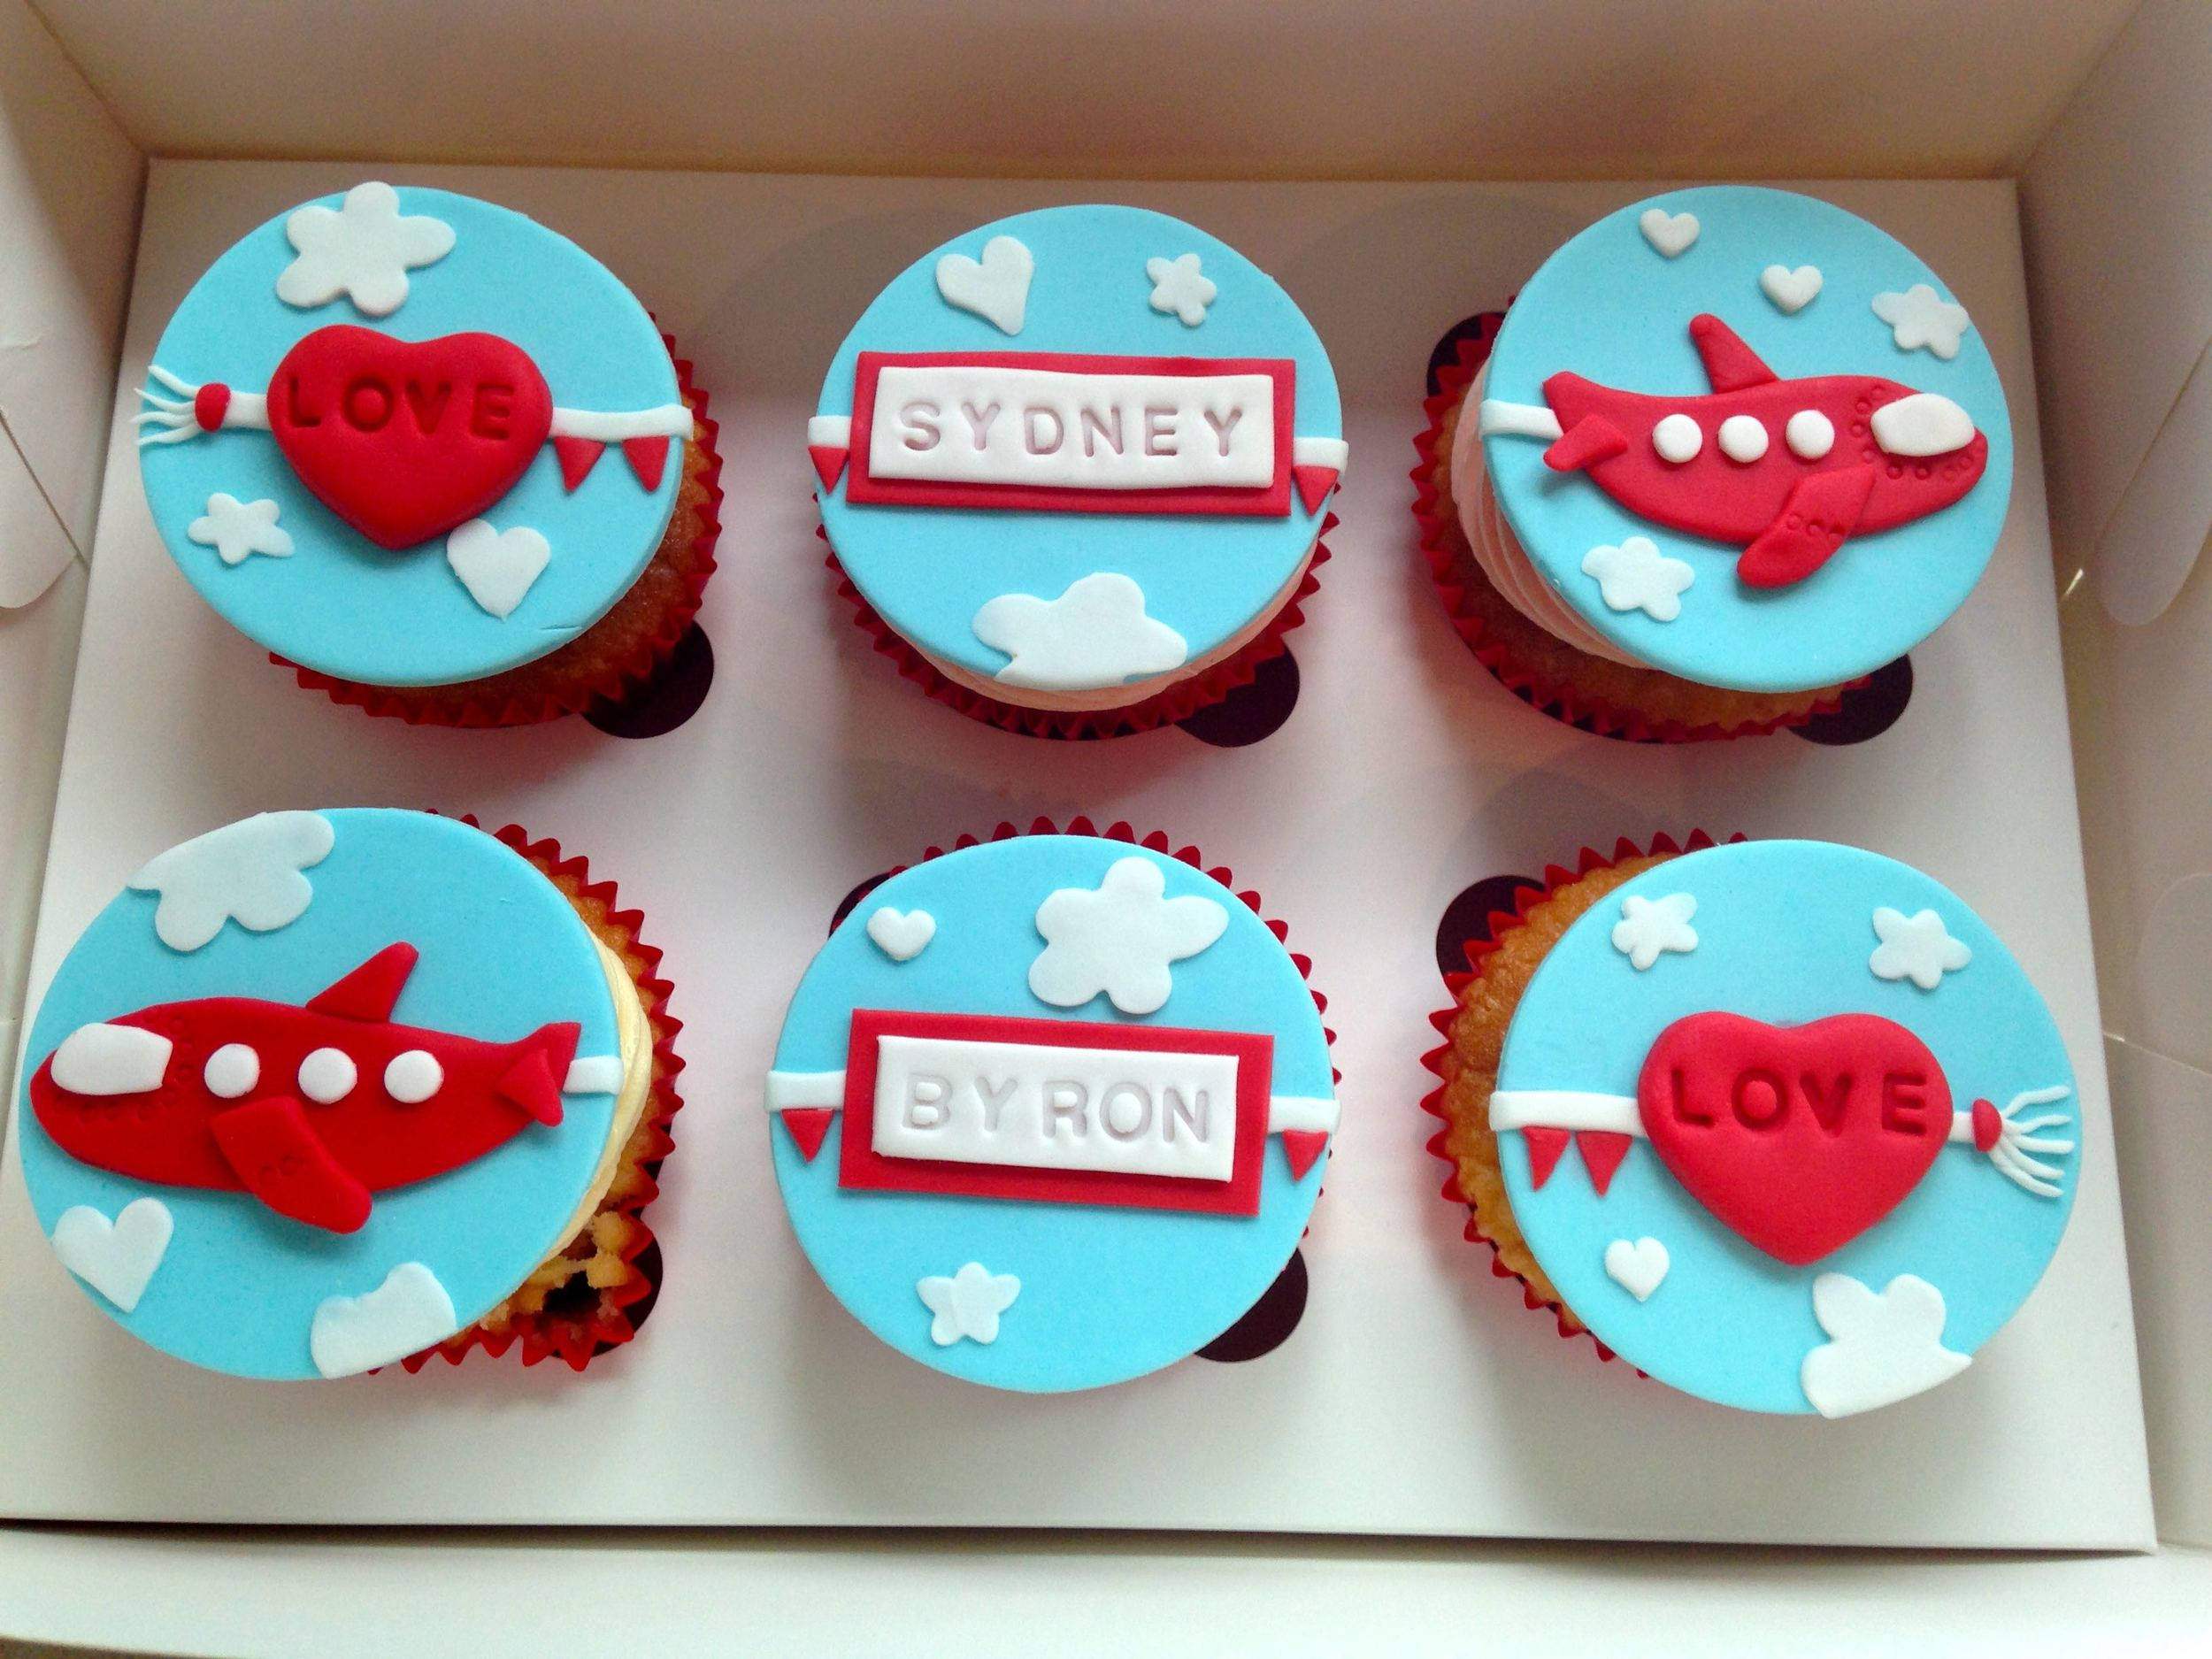 syd-byron cupcakes.jpg